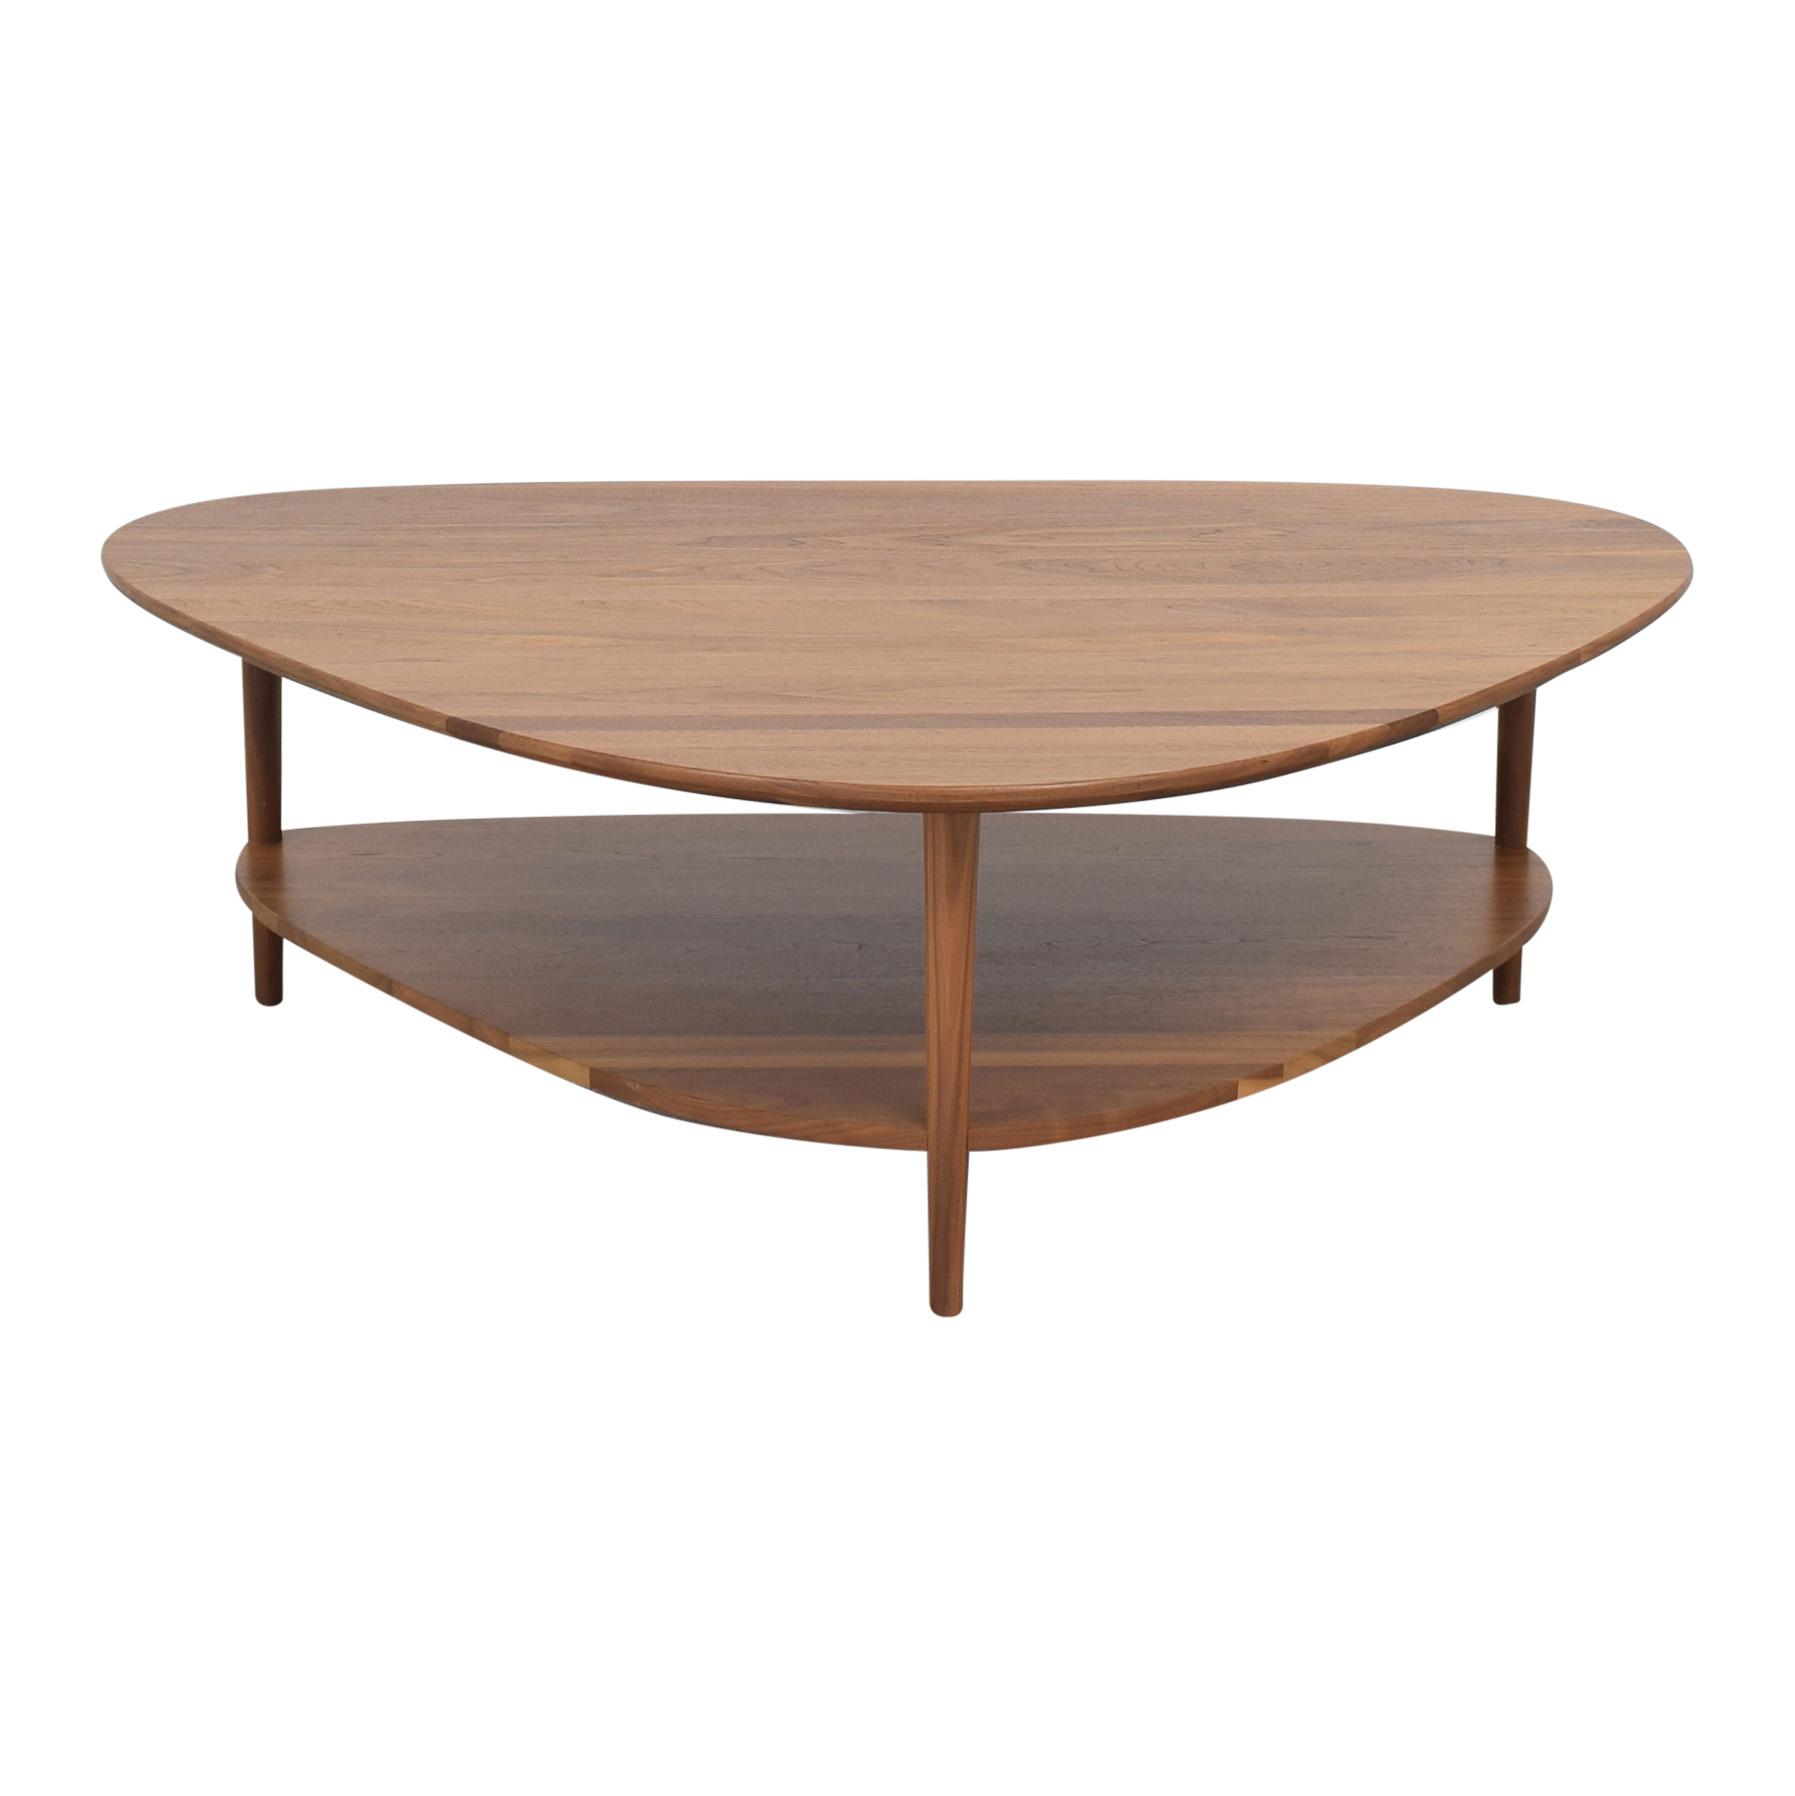 Room & Board Room & Board Gibson Coffee Table ct